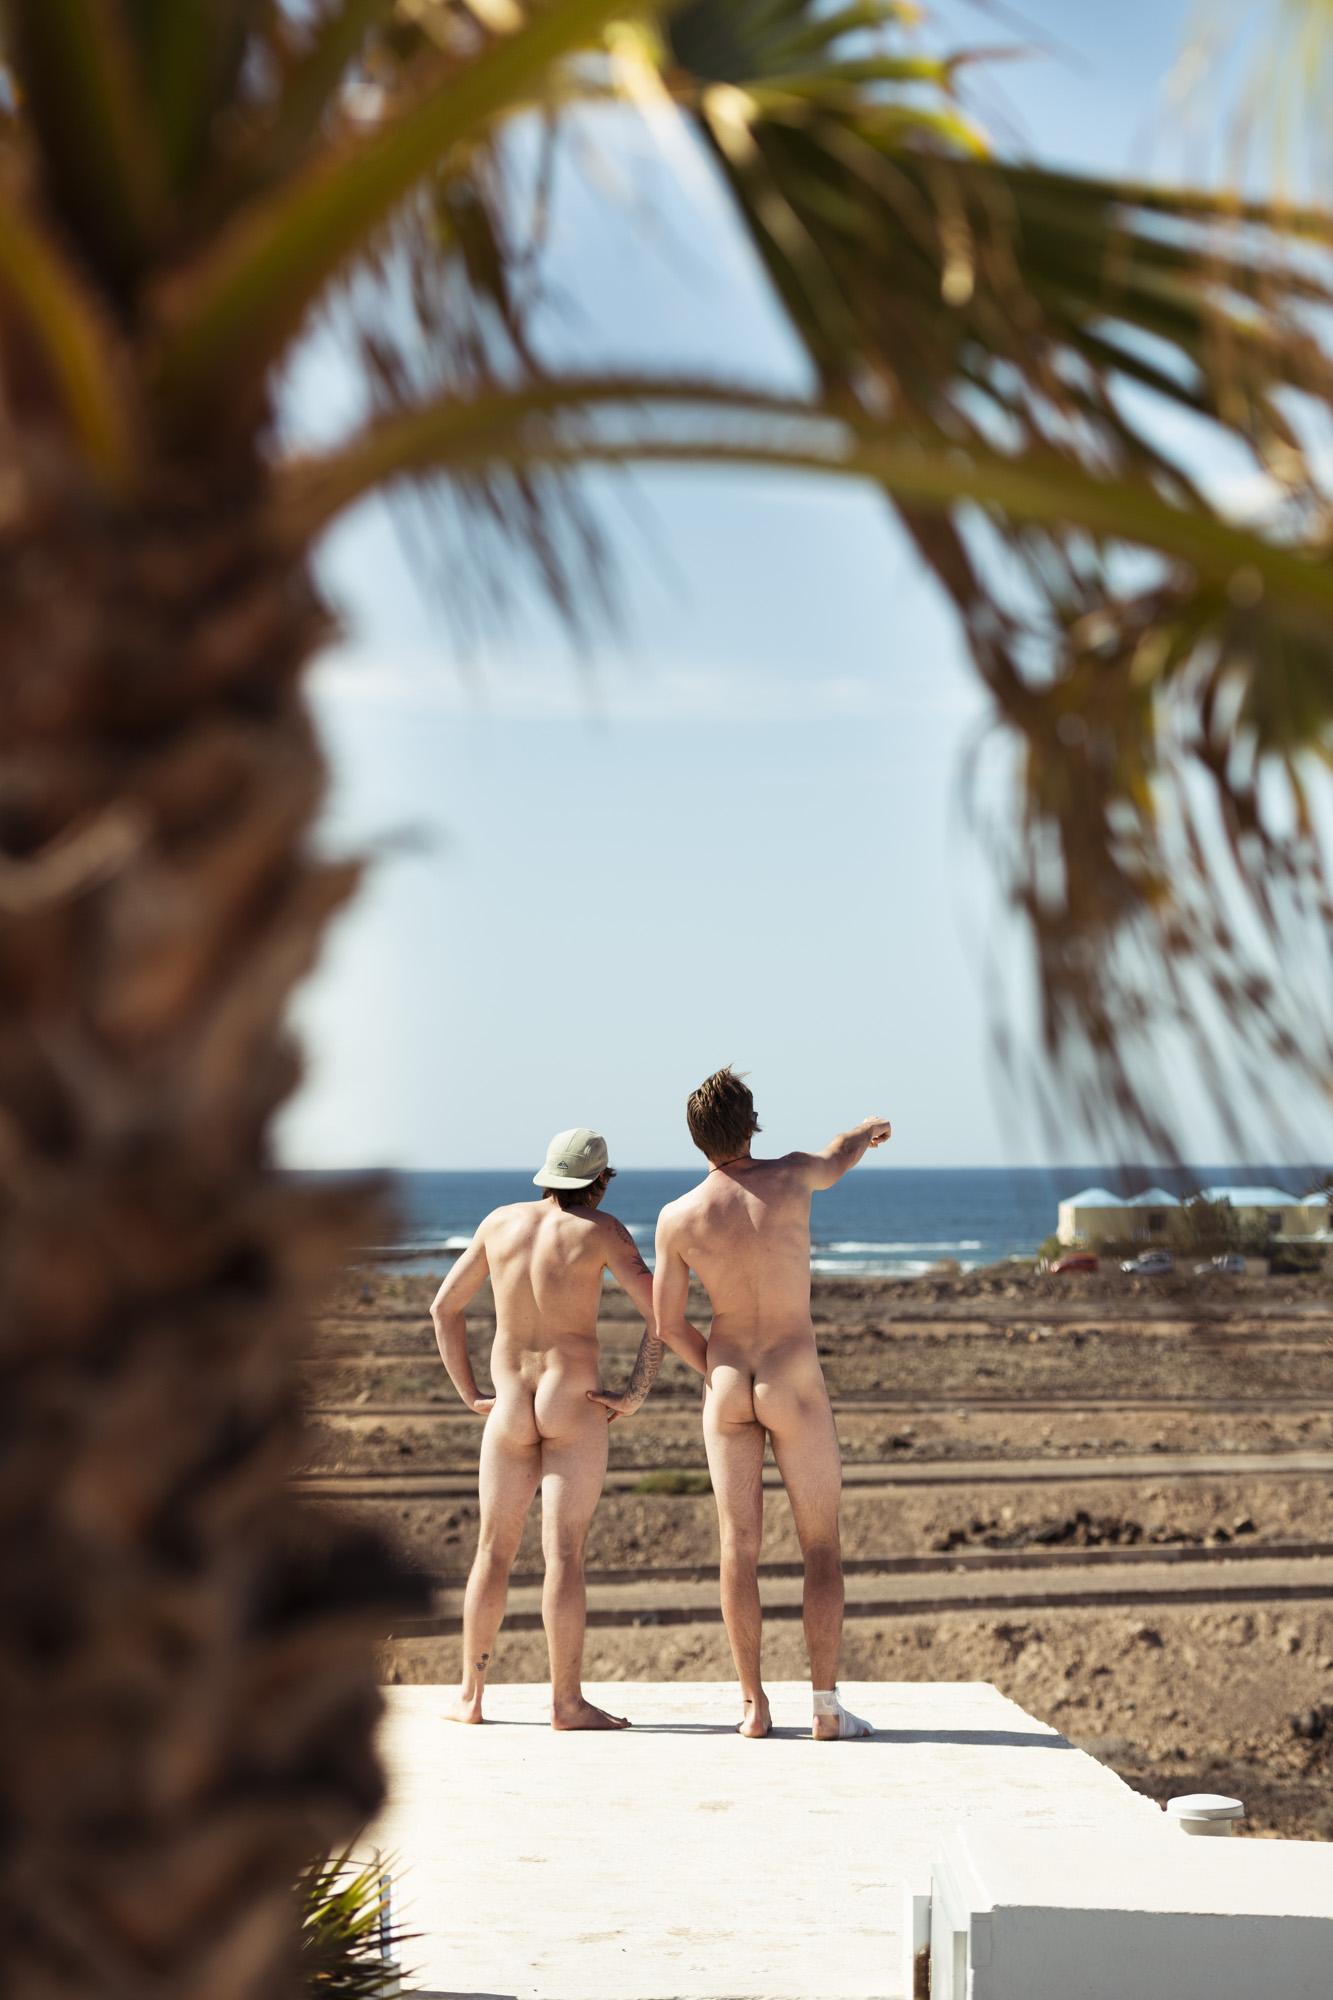 190221_Fuerteventura D850_8508516-Bearbeitet.jpg